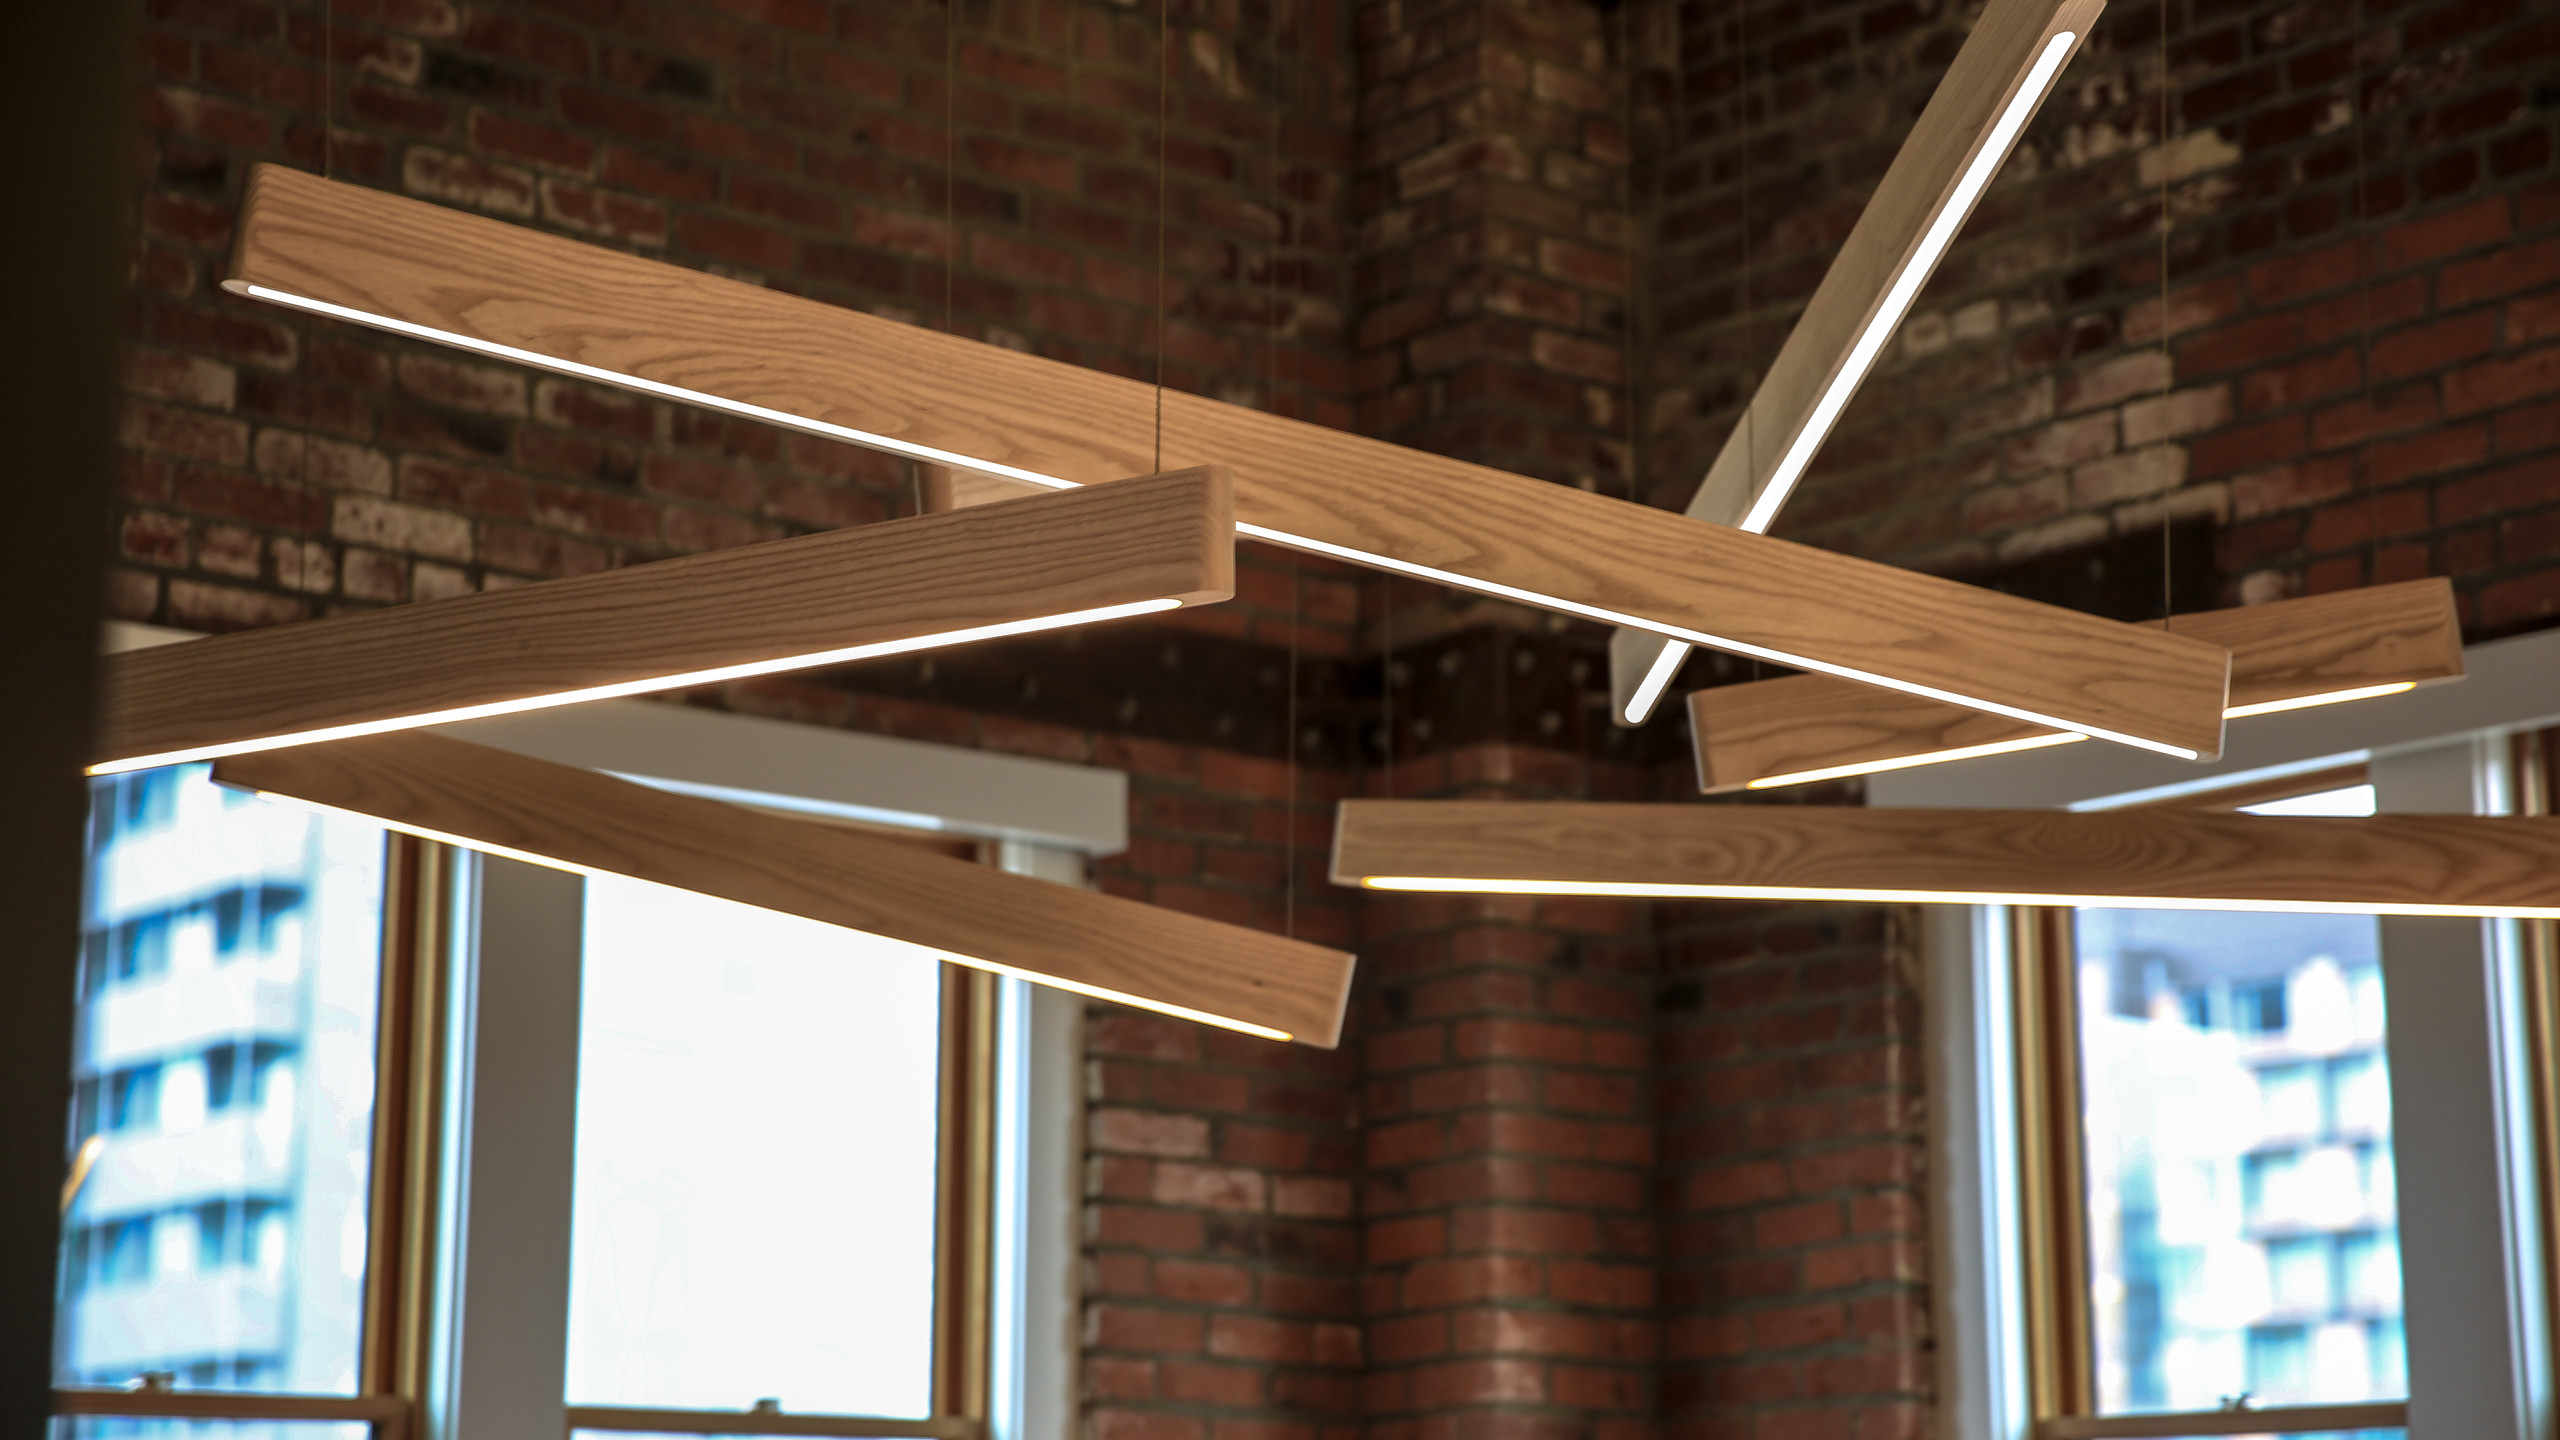 Line Lights by Matthew McCormick